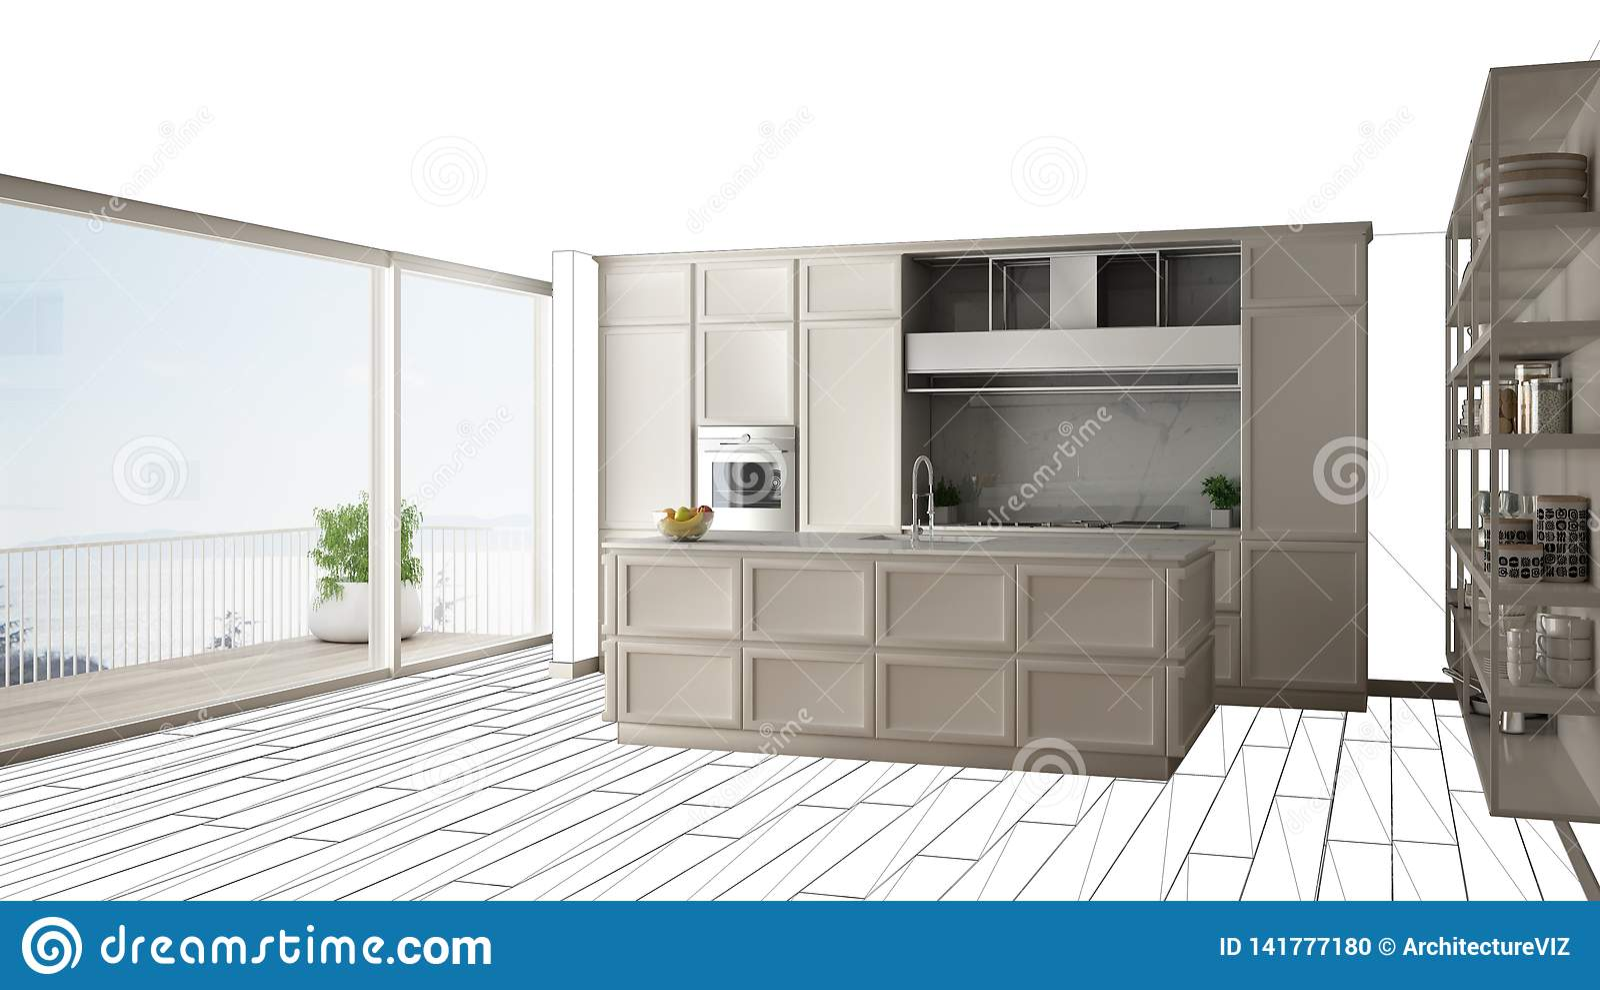 Modern White Kitchen With Island In Contemporary Luxury